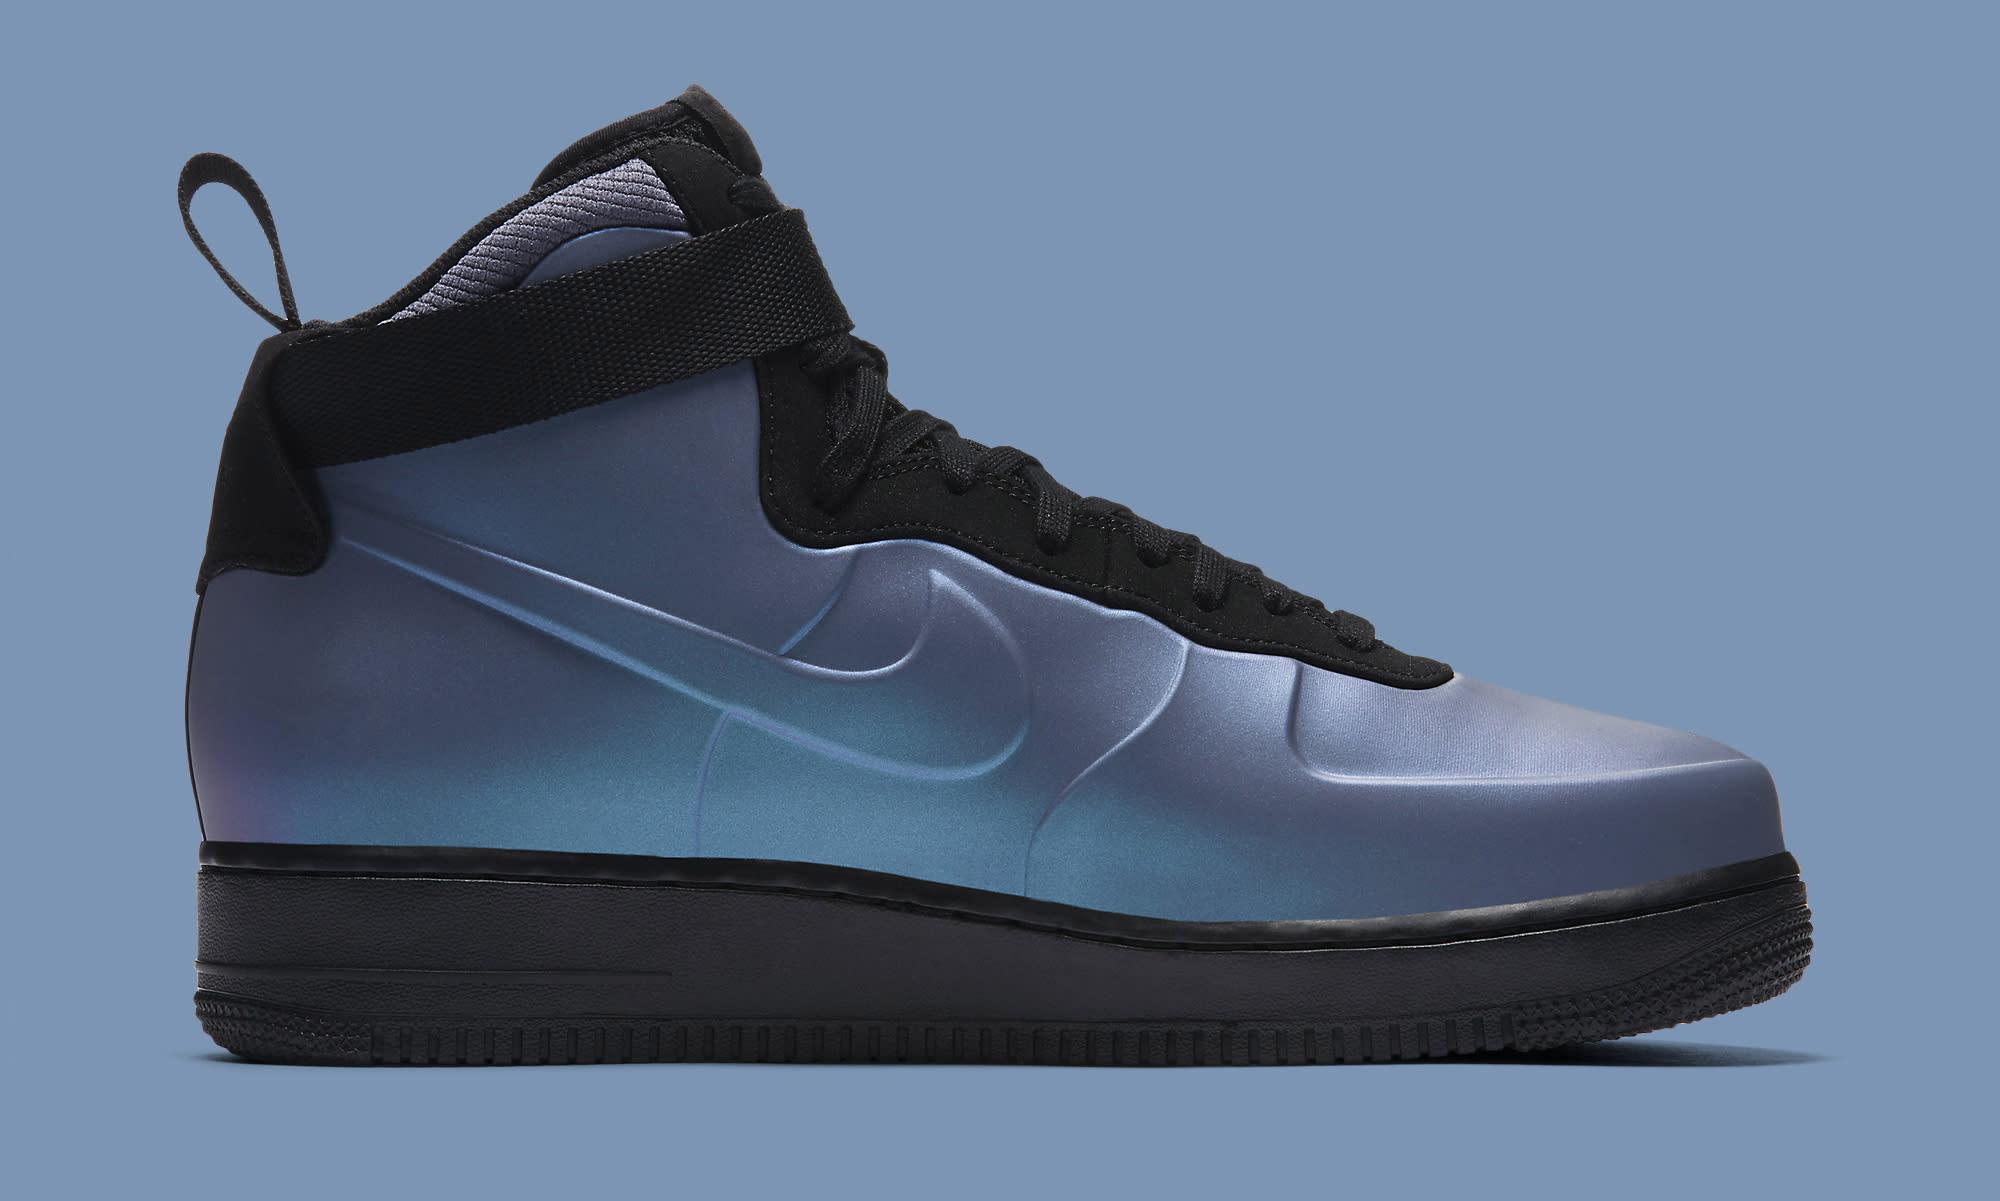 Nike Air Force 1 Foamposite Light Carbon AH6771-002 Medial